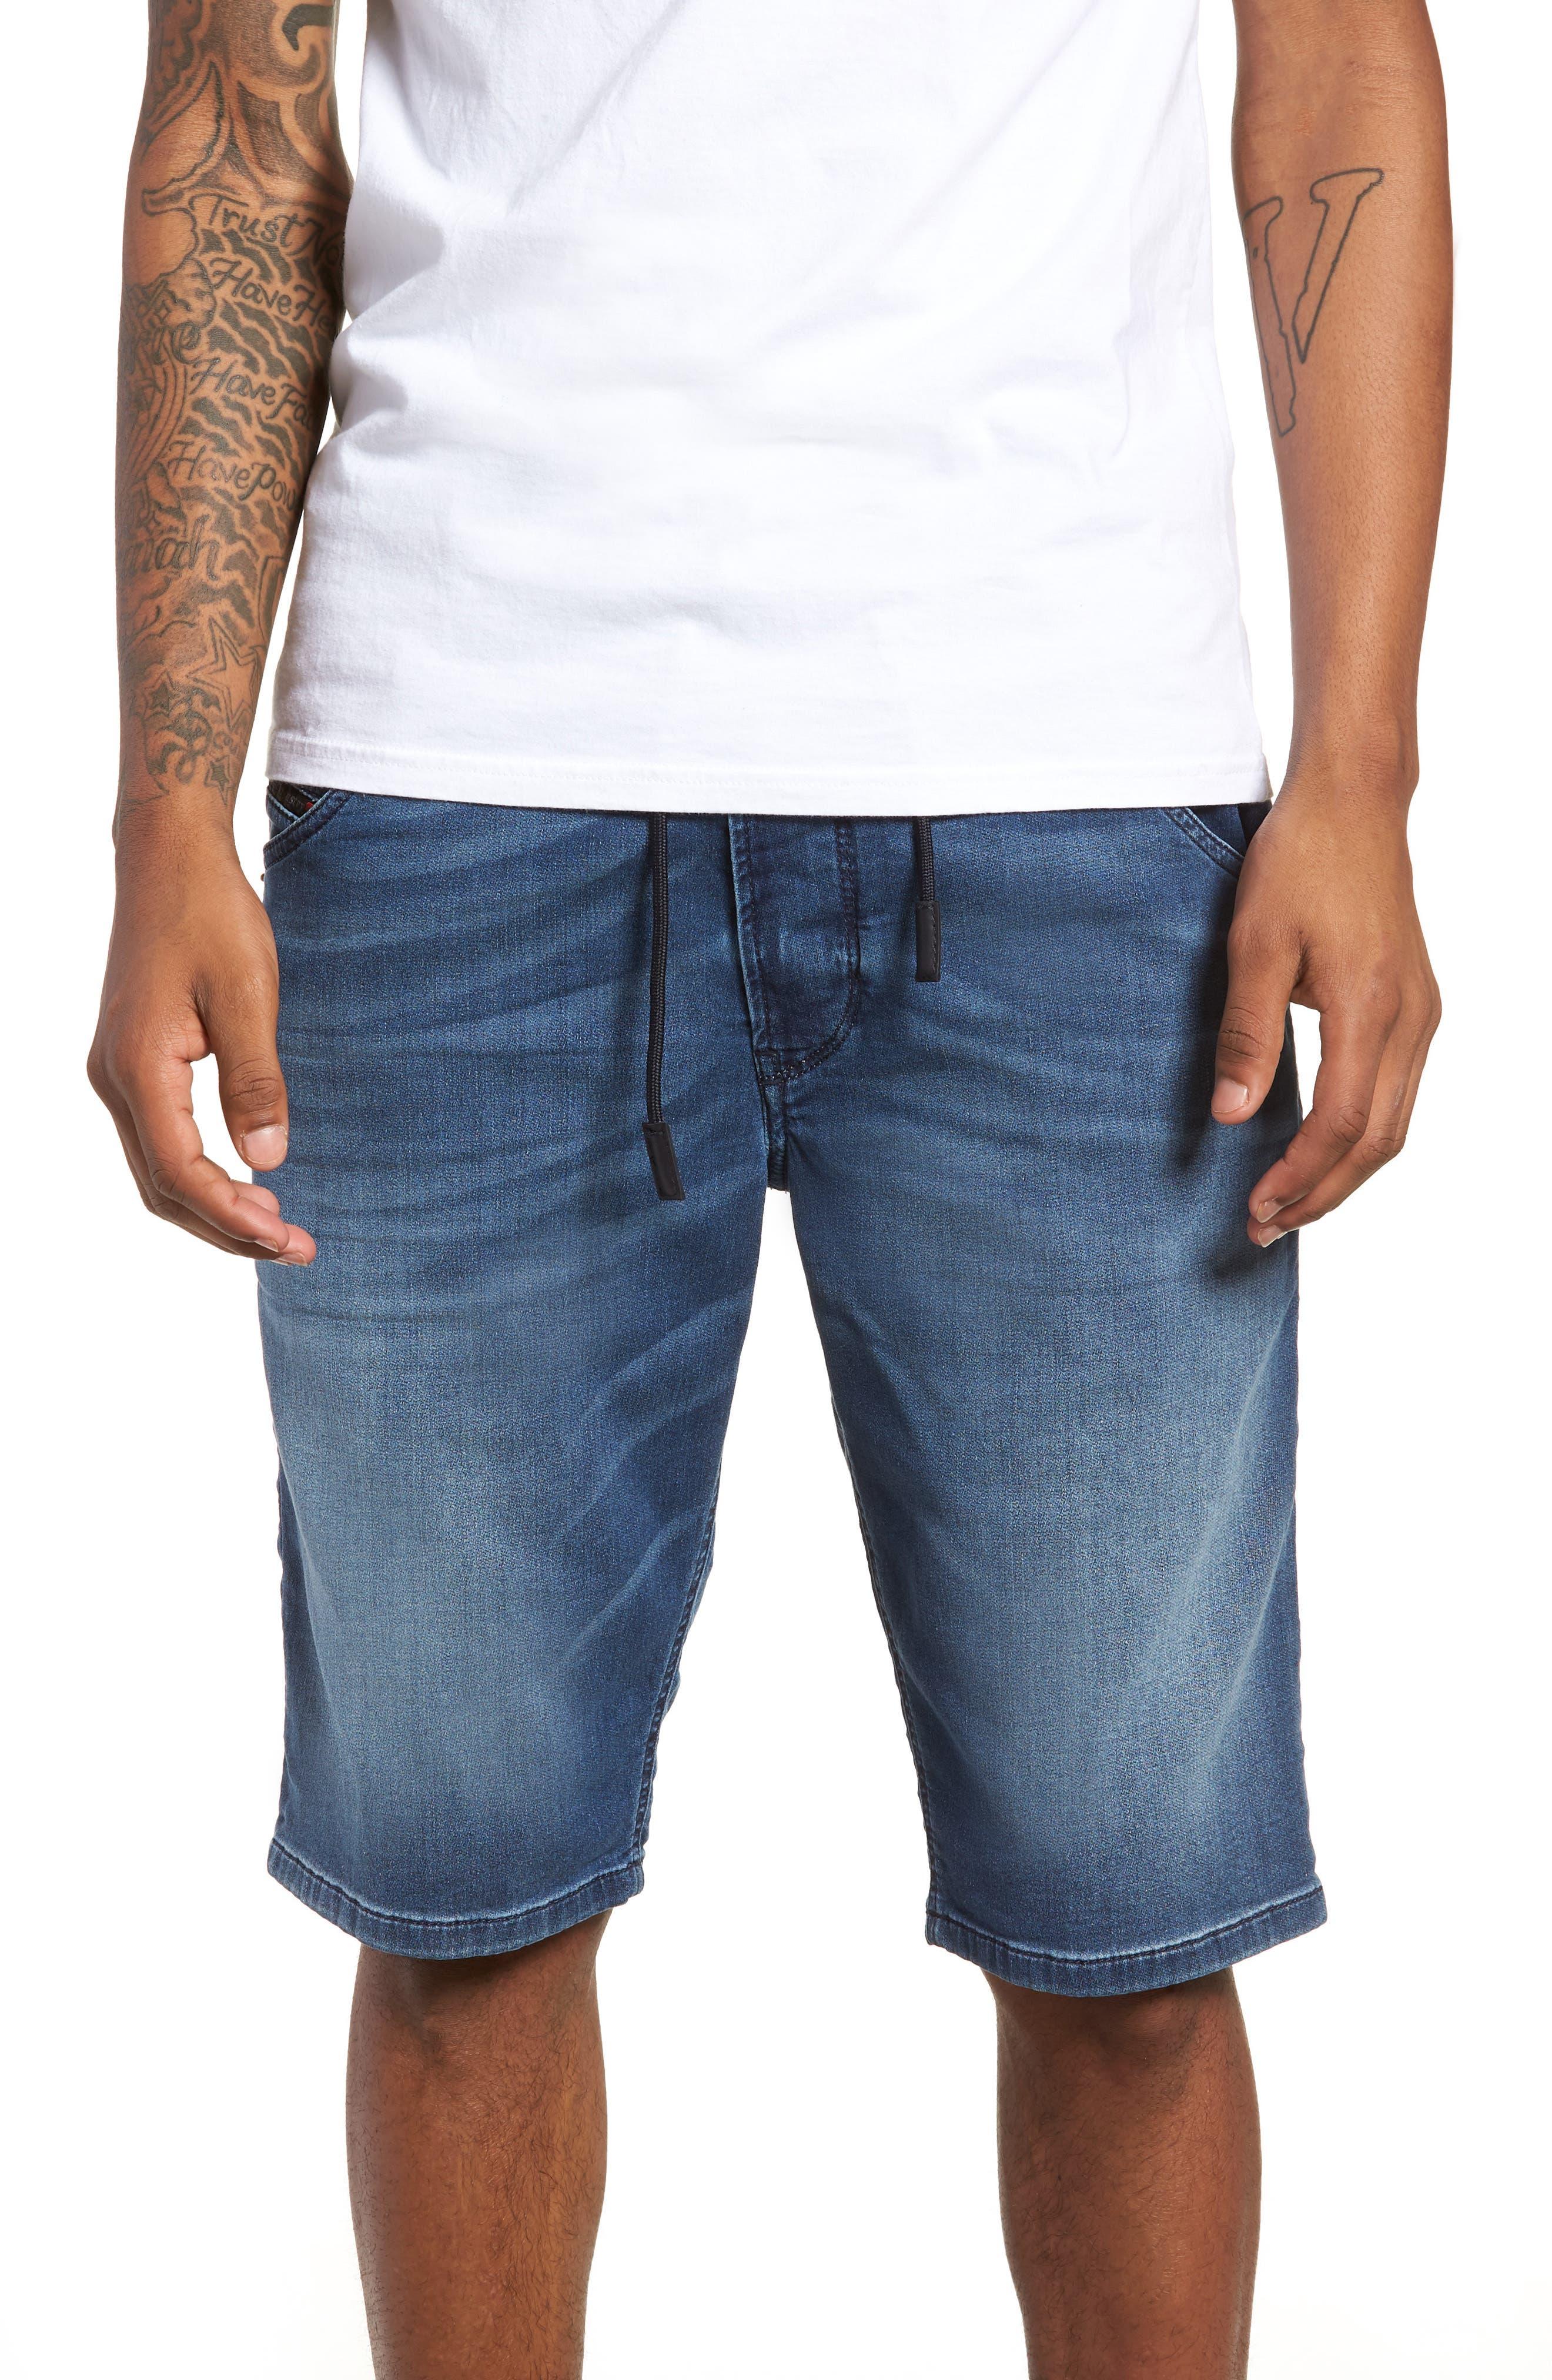 Krooshort Denim Shorts,                             Main thumbnail 1, color,                             0687C